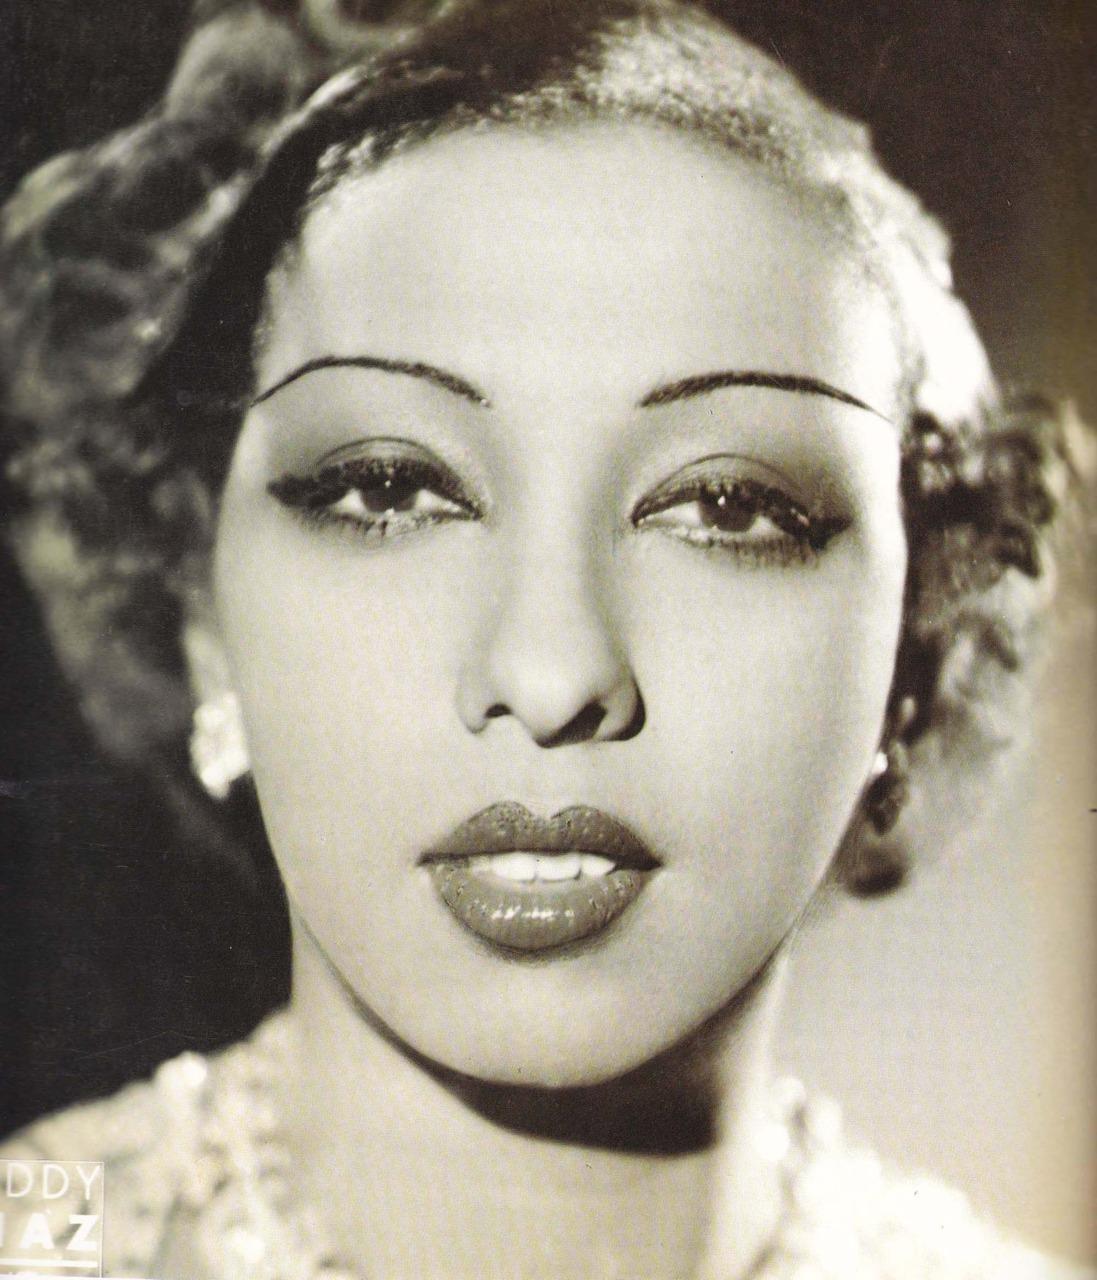 Fashionable Forties: Josephine Baker